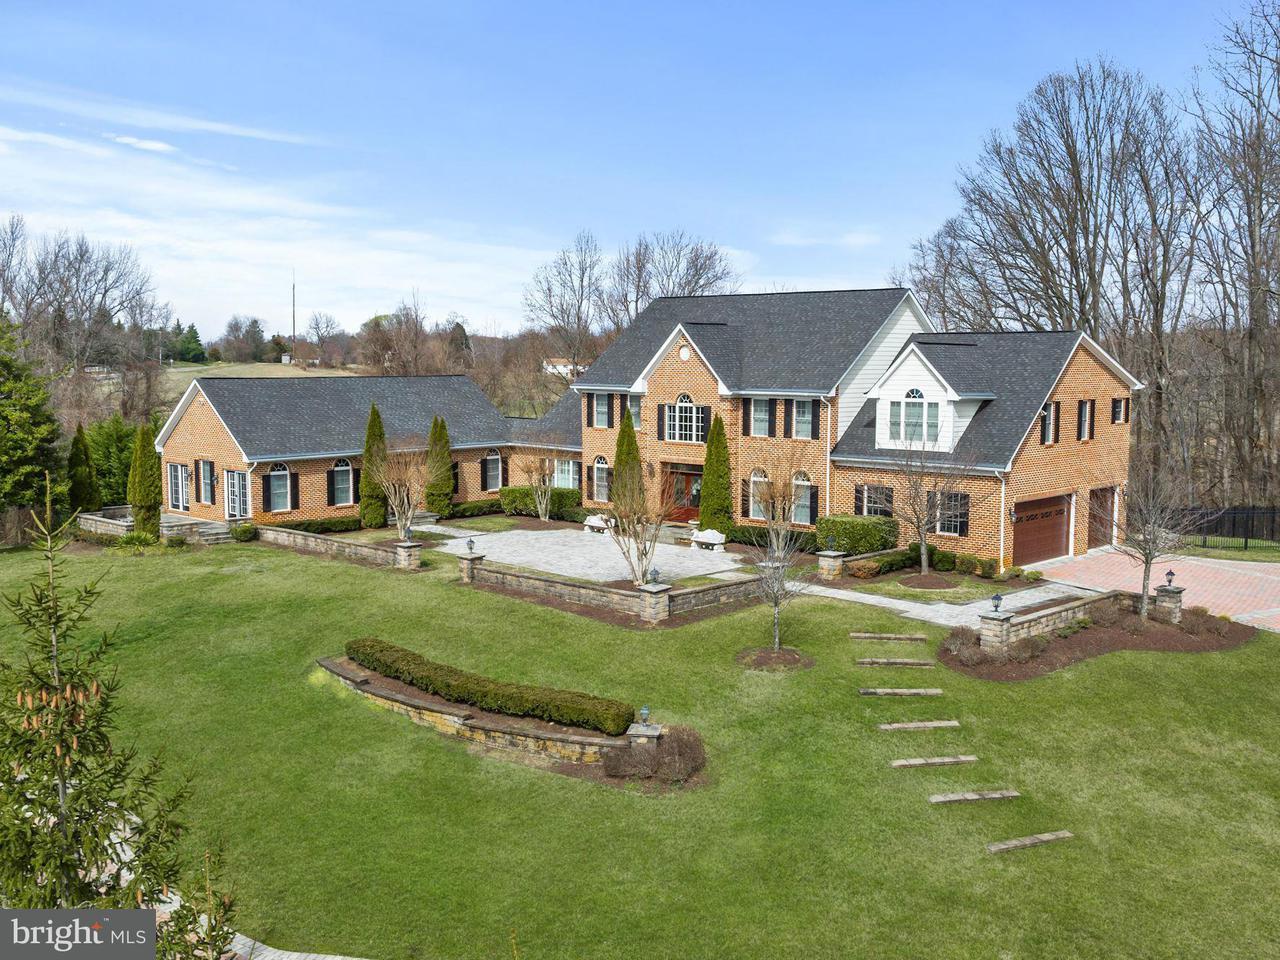 Single Family Home for Sale at 3587 Birdsville Road 3587 Birdsville Road Davidsonville, Maryland 21035 United States